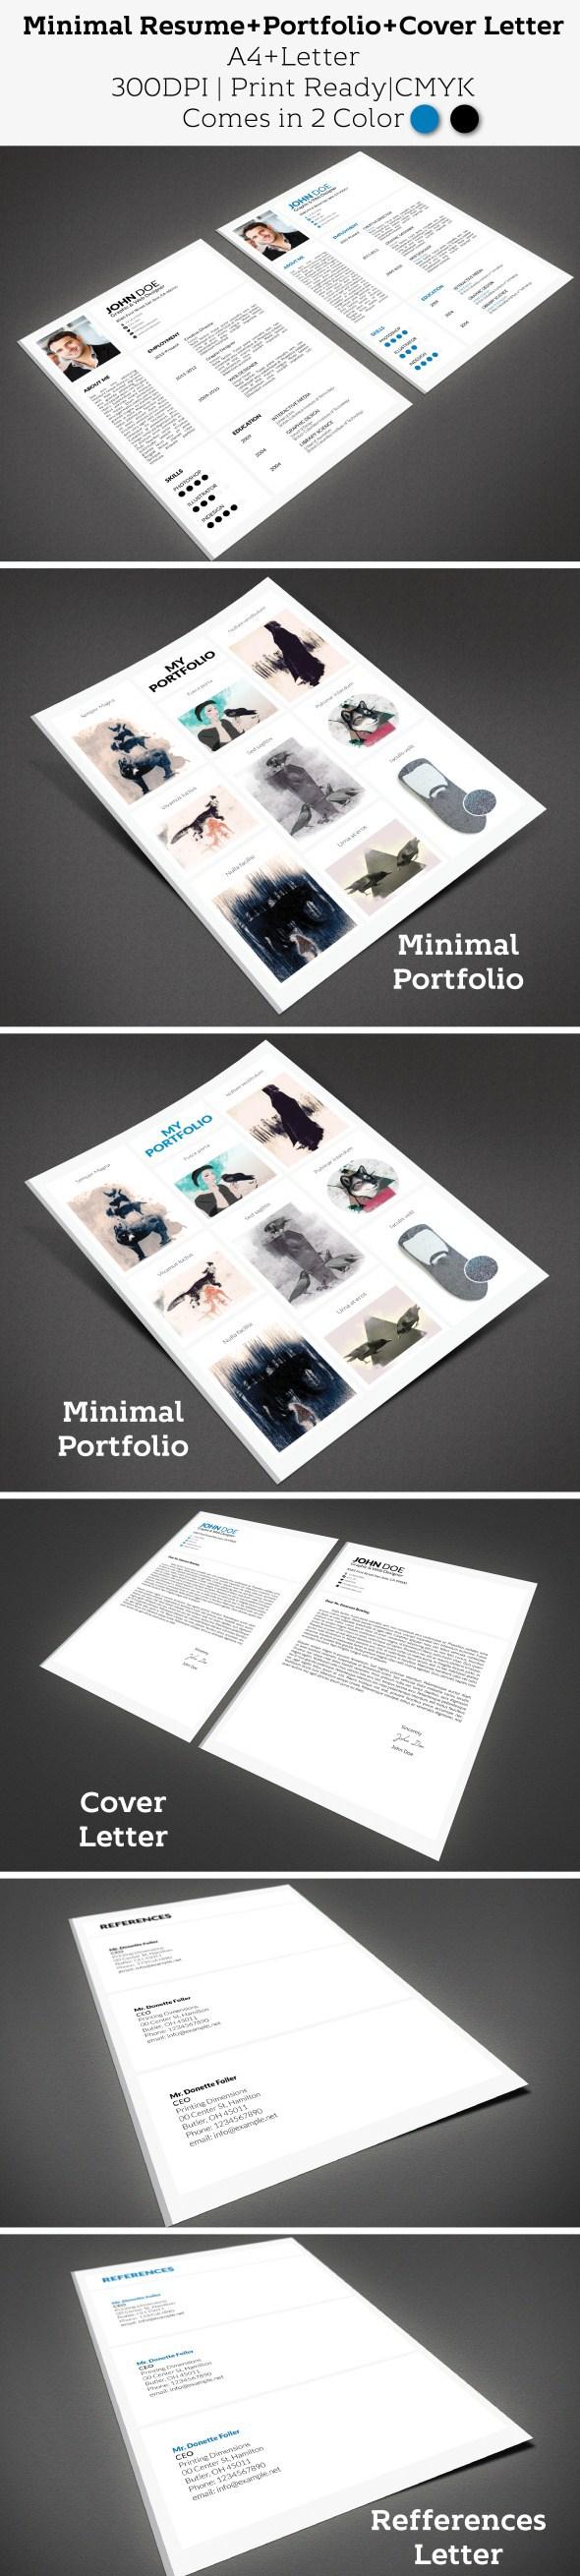 Minimal Resume clean Resume cover letter Creative Resume elegant minimal minimalist modern portfolio CV portfolio resume freebie free